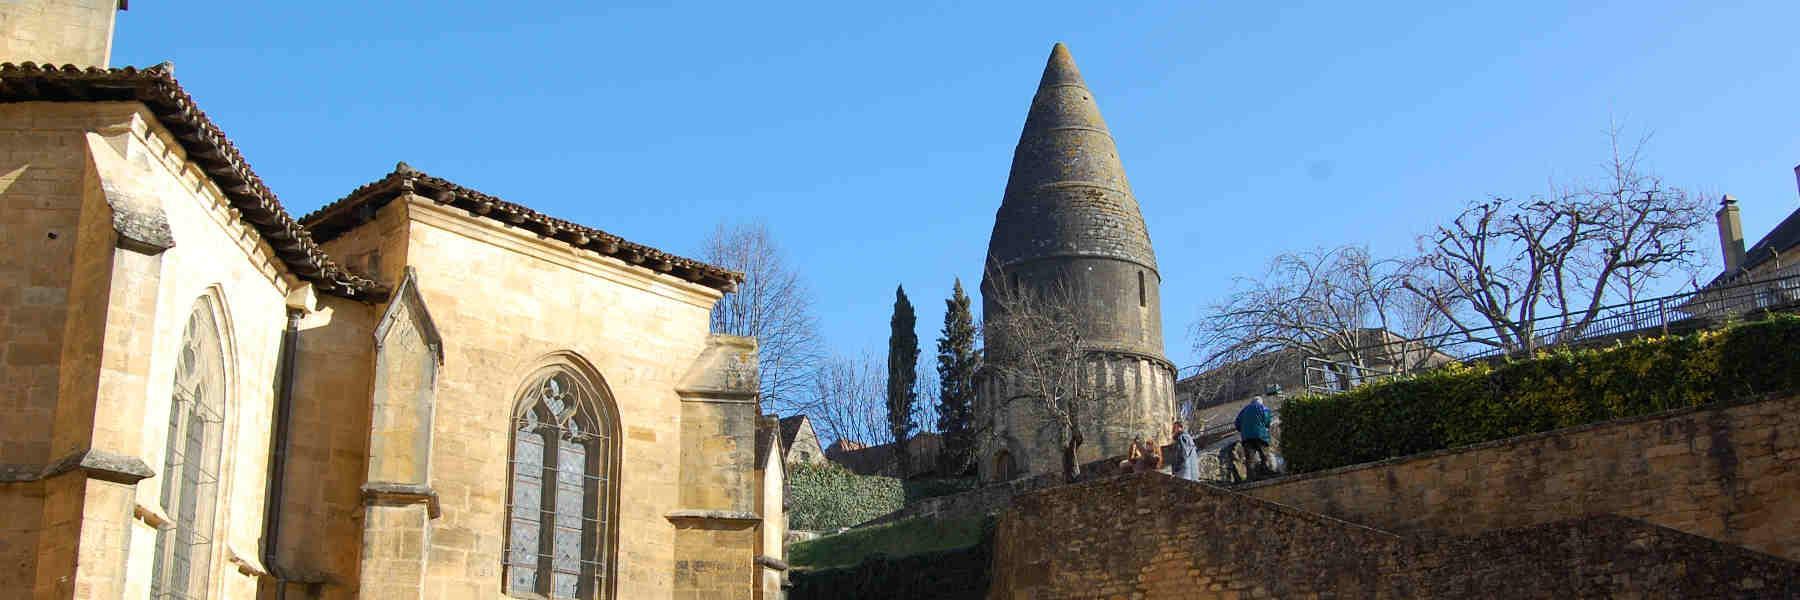 Visite de la ville de Sarlat-la-Caneda